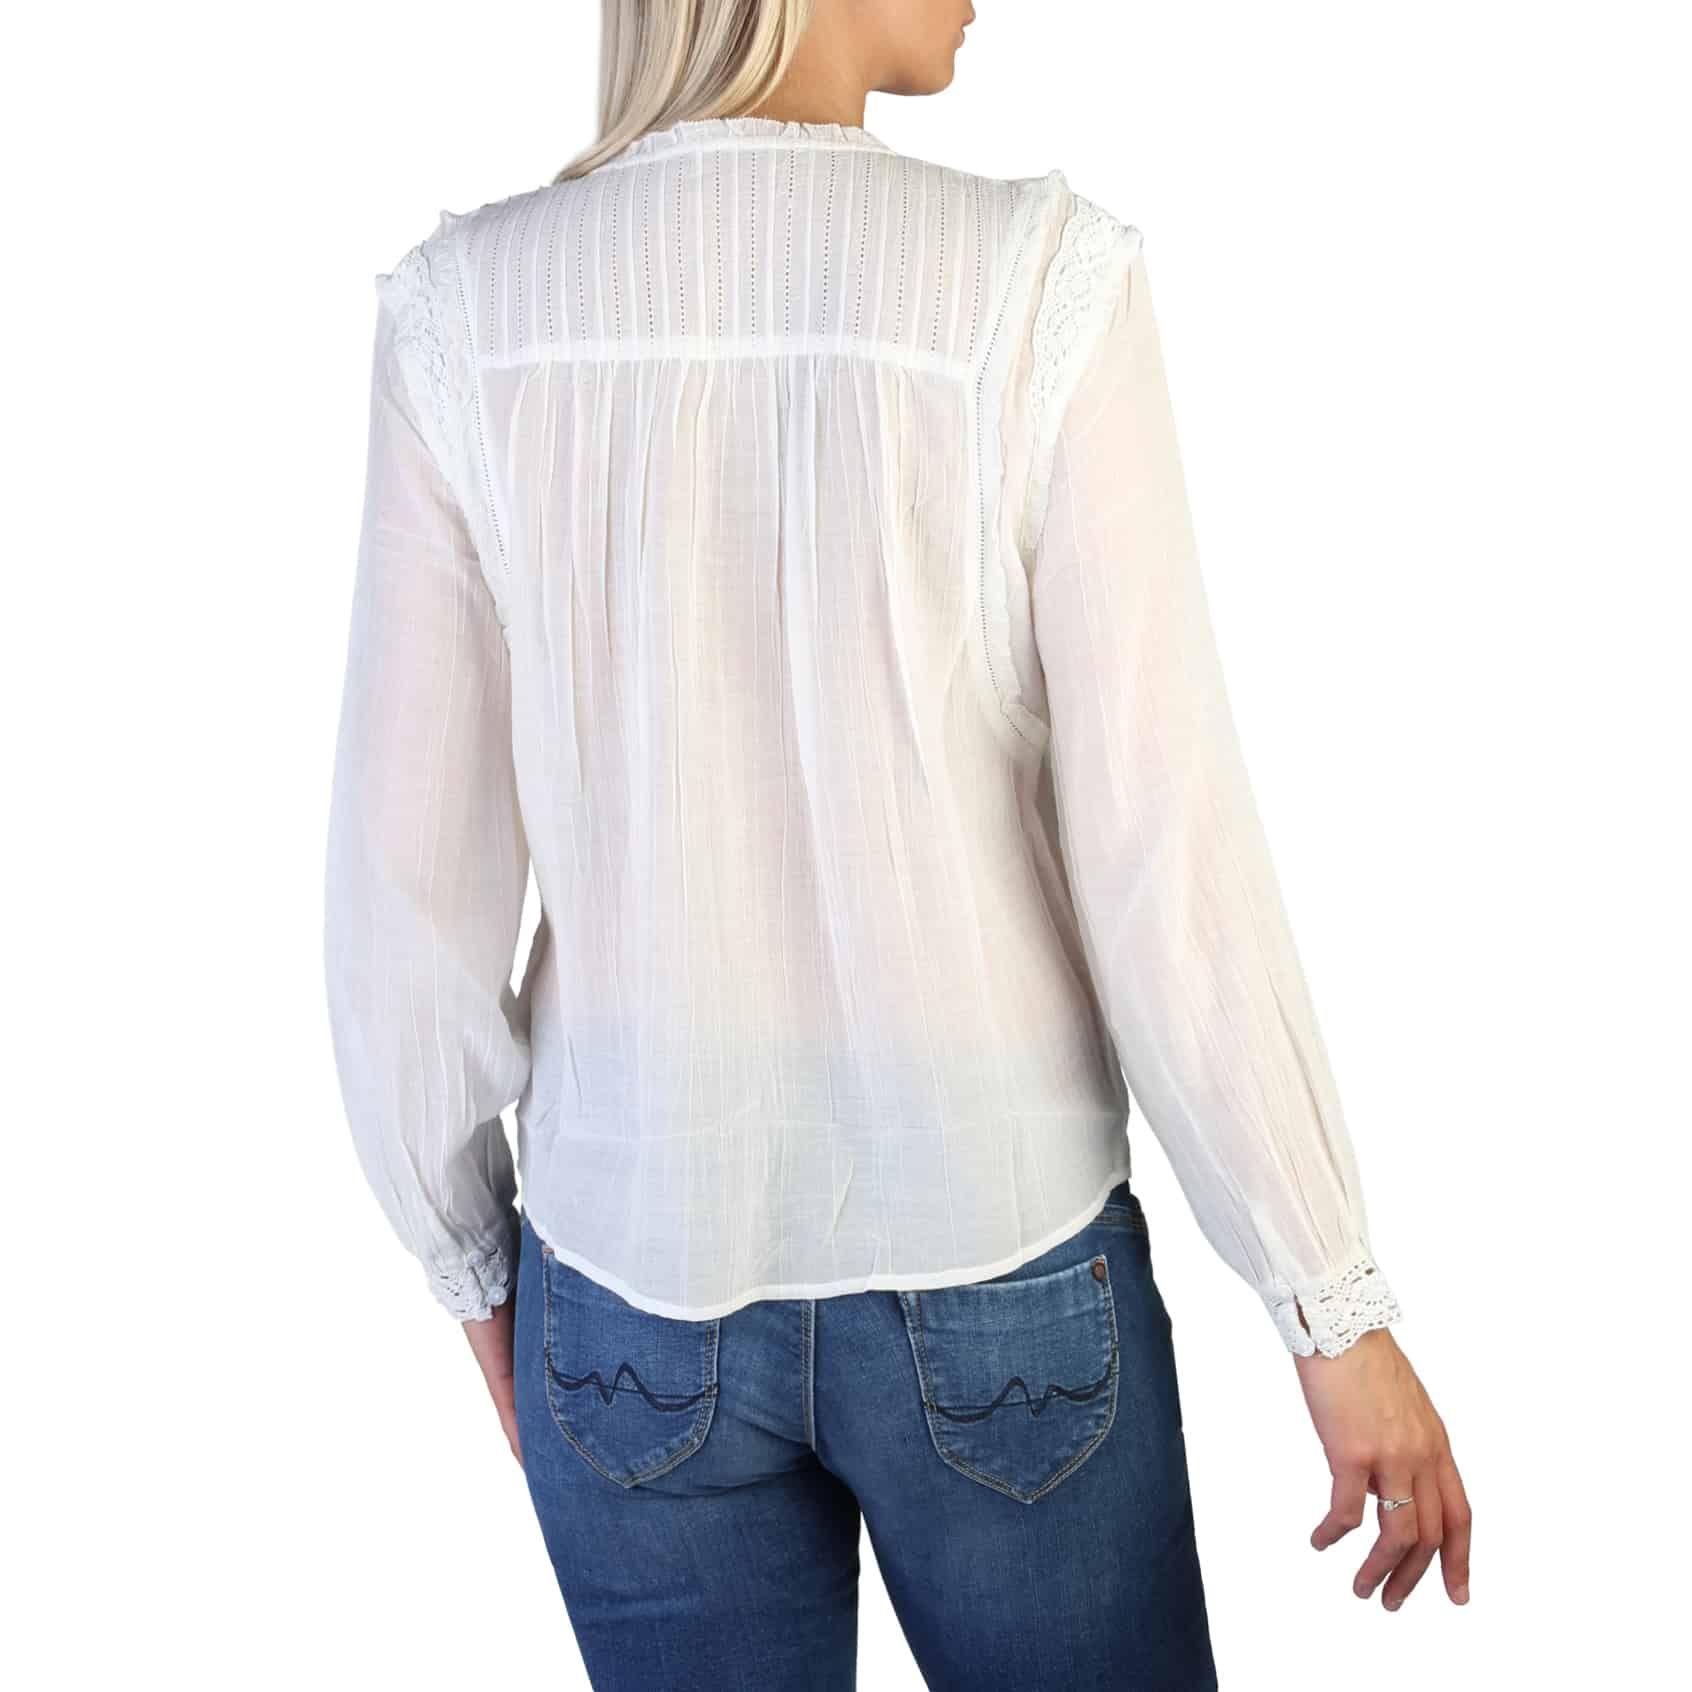 Pepe Jeans – ALBERTINA_PL303938 – Blanco